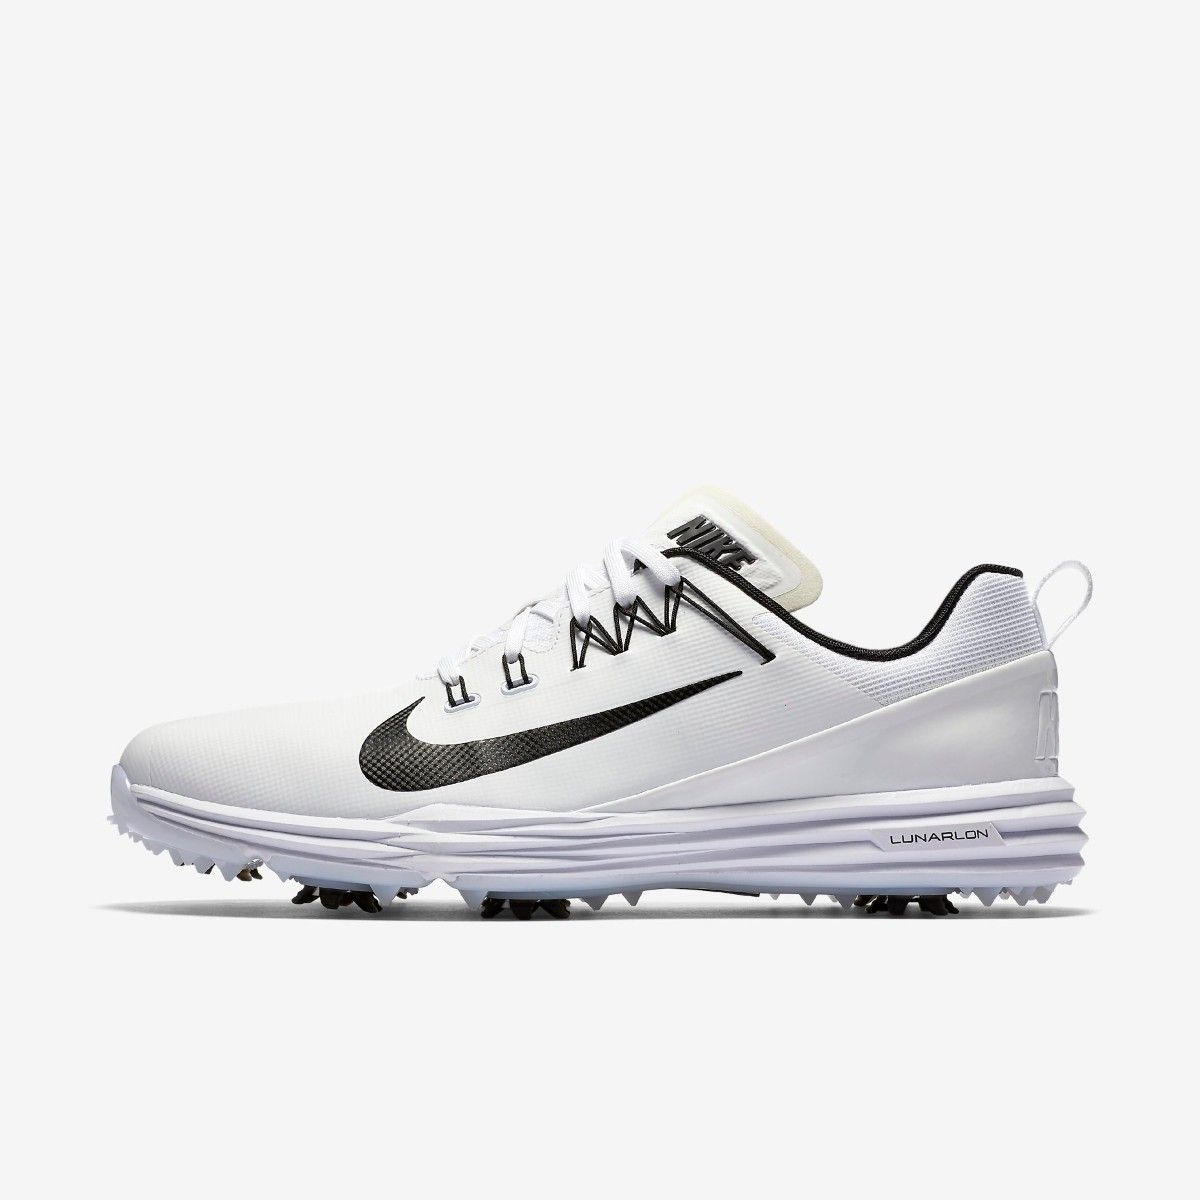 wholesale dealer 6c0ab 051c5 The World s Premier Golf Improvement Program. Nike Lunar Command 2 Golf Shoe  - White